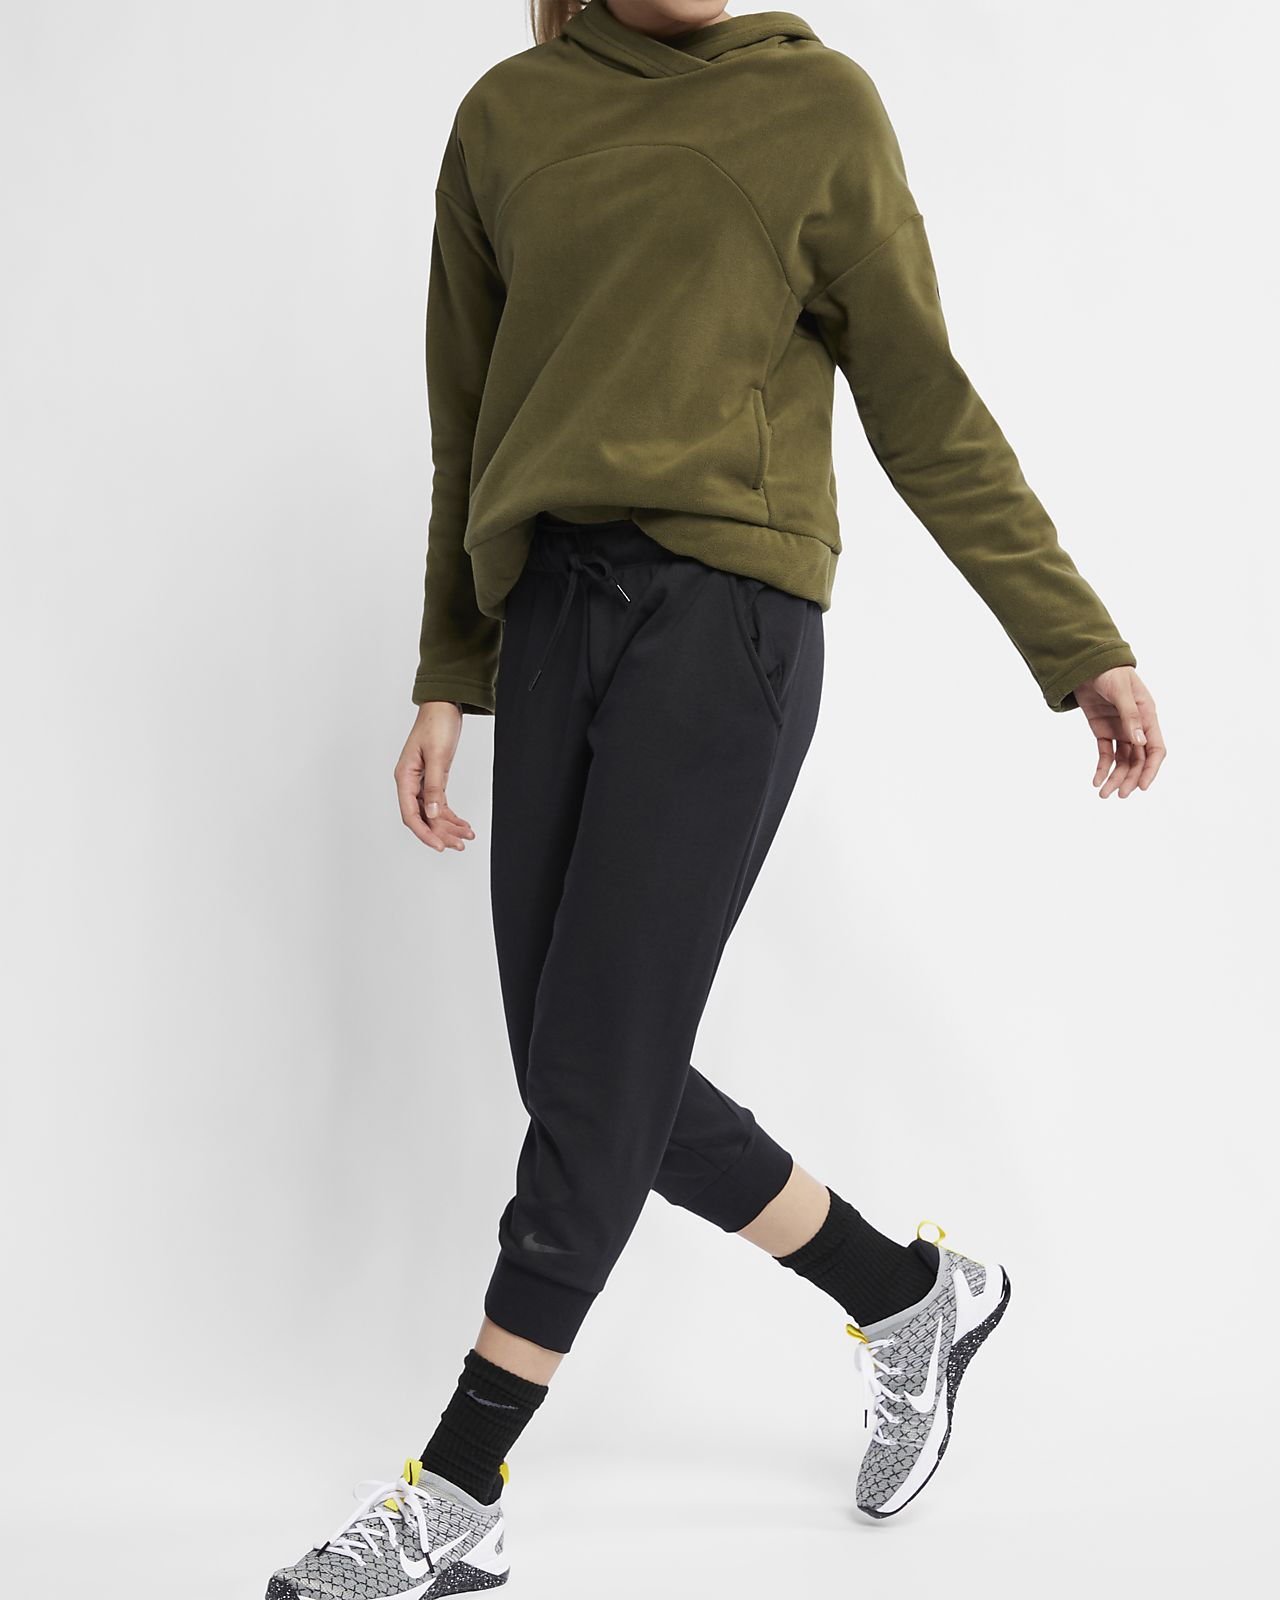 1484630c3893 Nike Dri-FIT Endurance Women s Training Crops. Nike.com